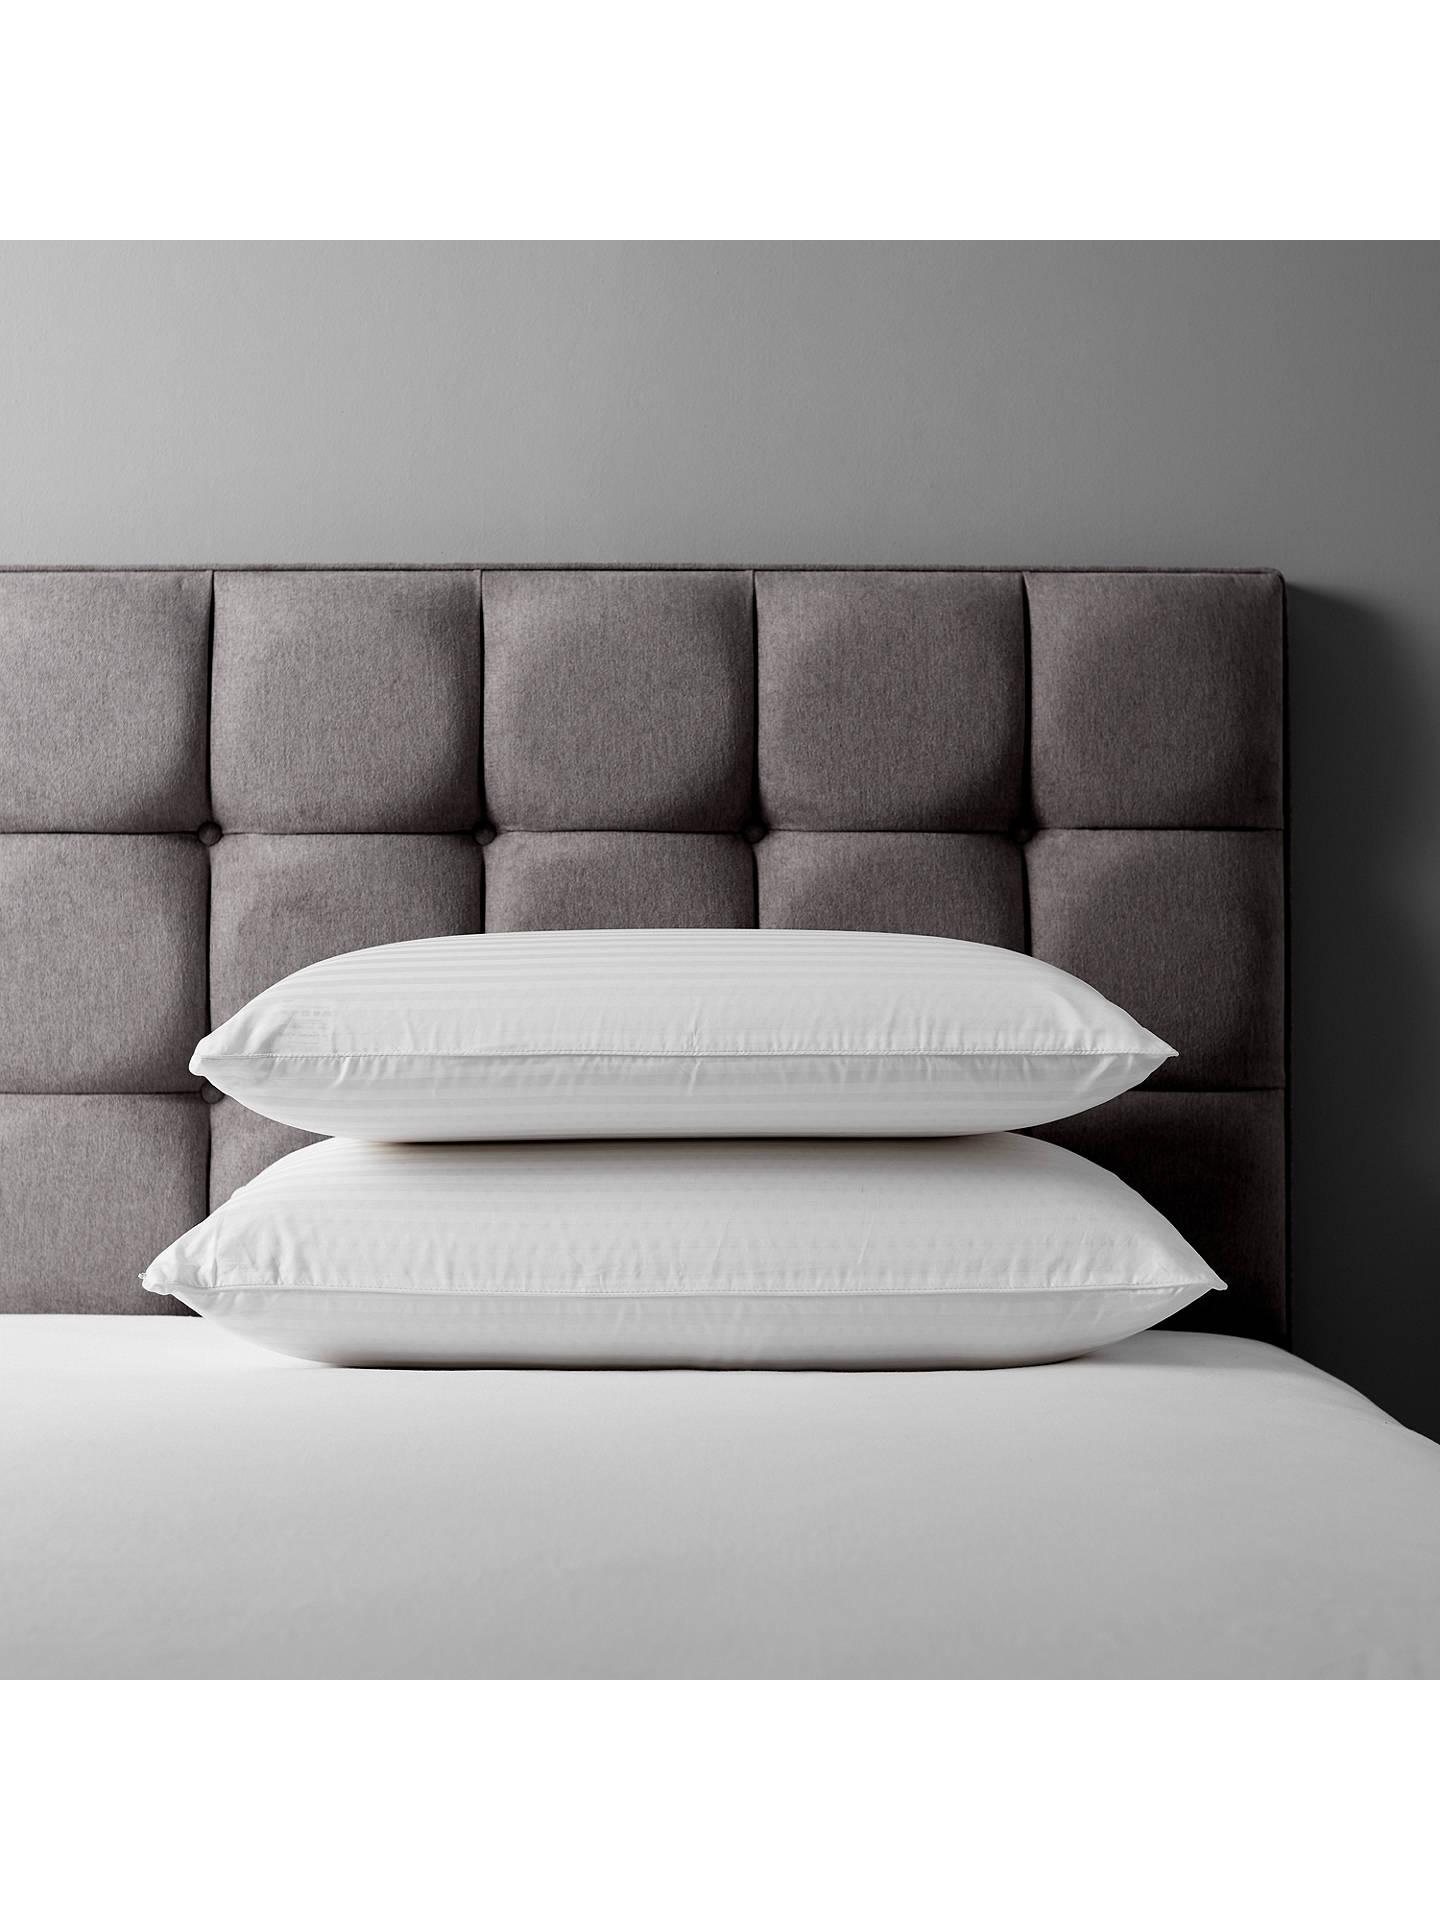 Dunlopillo Latex Serenity Pillow